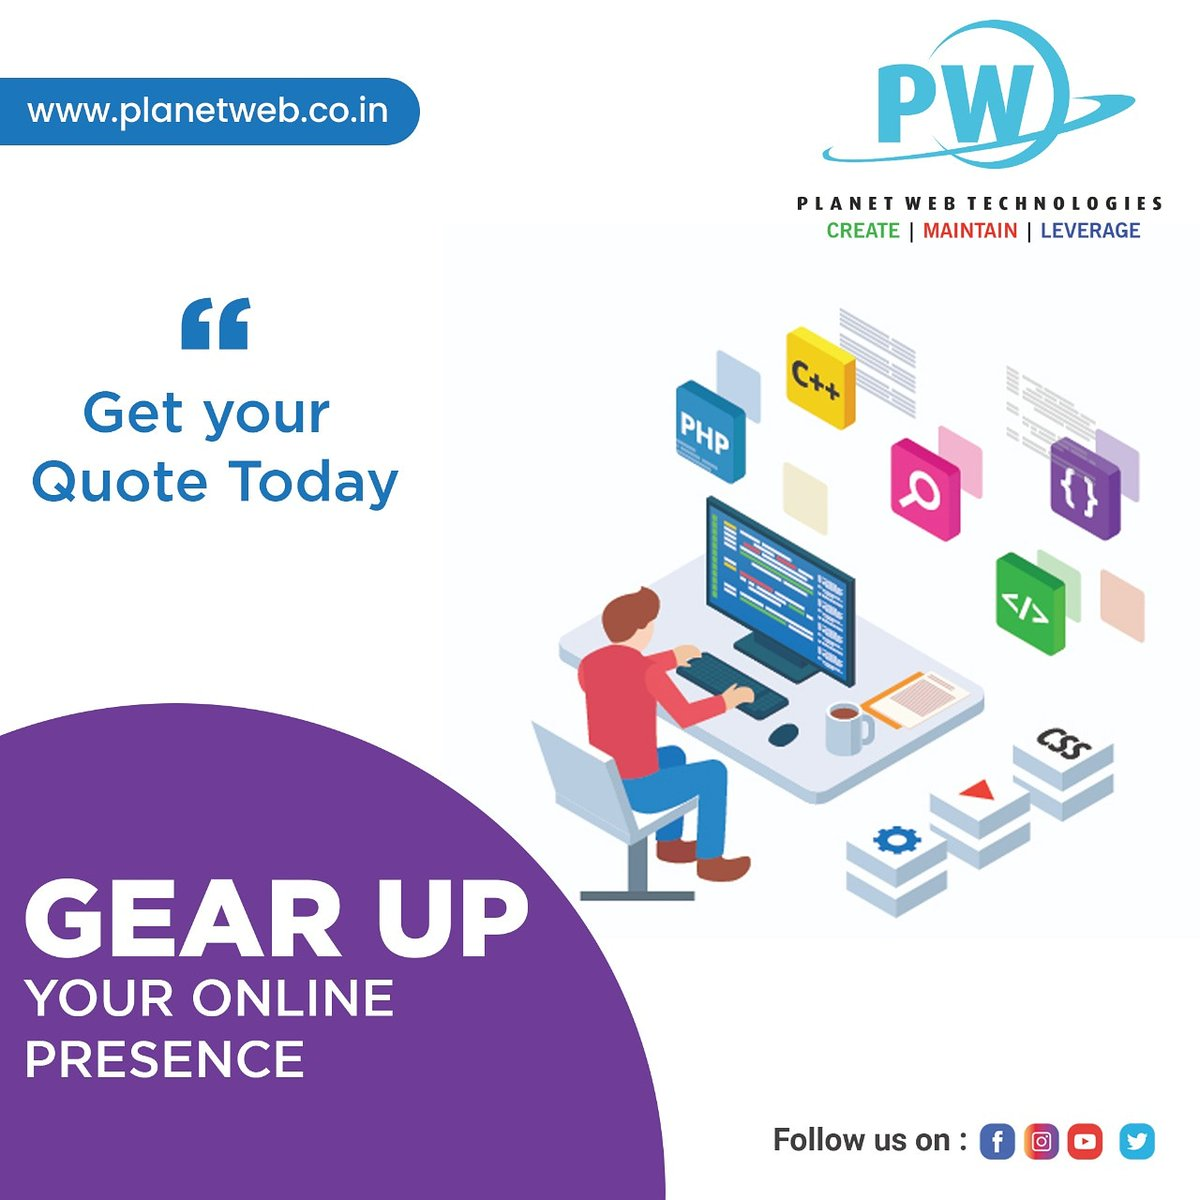 Gear up your online presence by our services by experienced developers.  #services #websitedevelopment #webdevelopment #digital #smm #bulksms #websitepic.twitter.com/XCqKhZQJ40